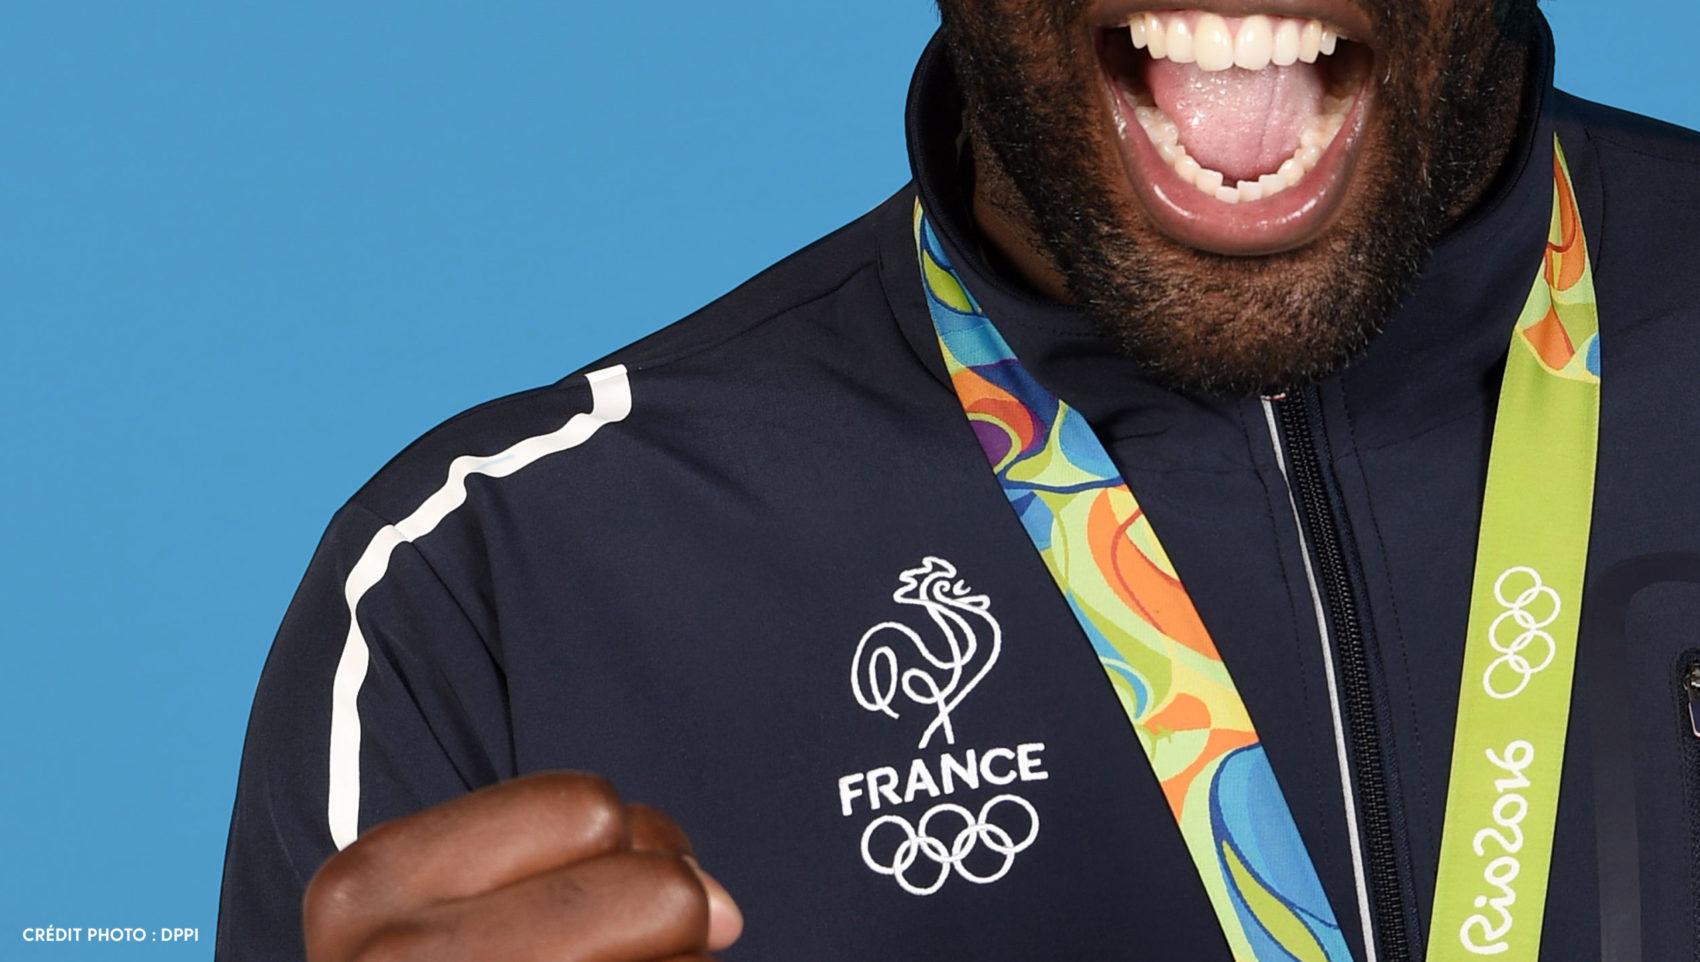 Projet_project_realisation_CNOSF_comite_national_olympique_et_sportif_francais